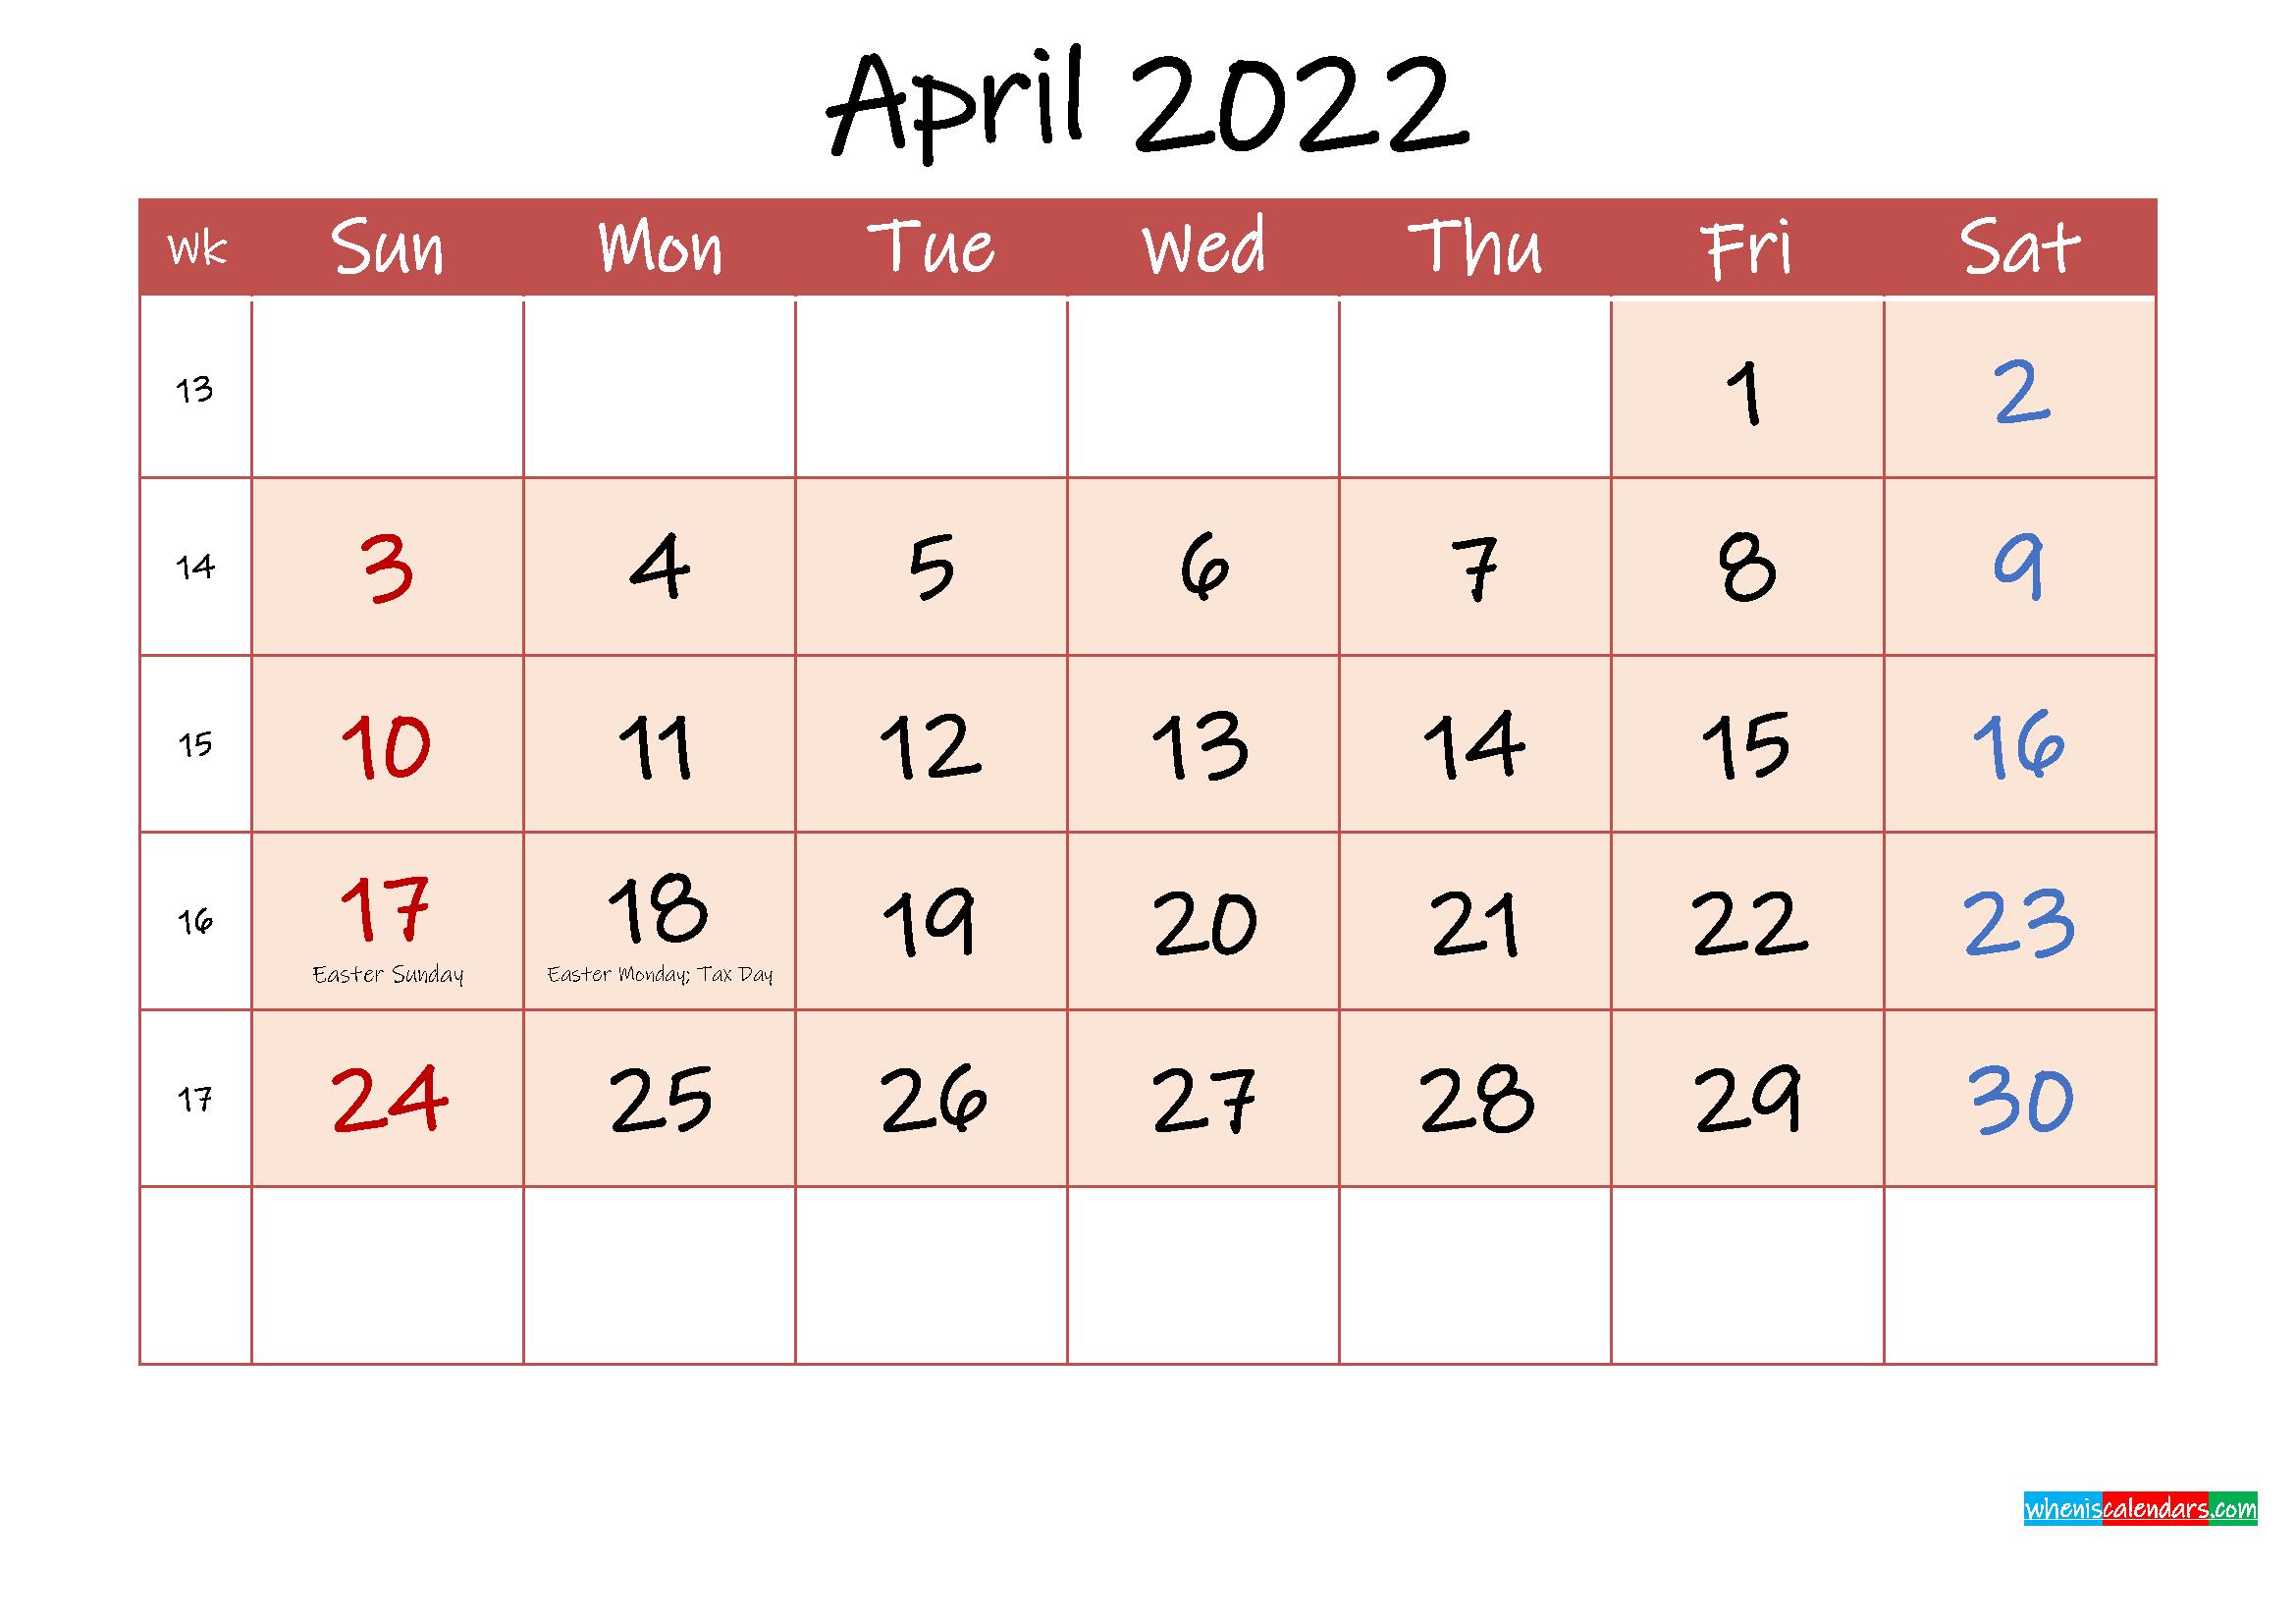 April 2022 Free Printable Calendar With Holidays pertaining to Print Calendar April 2022